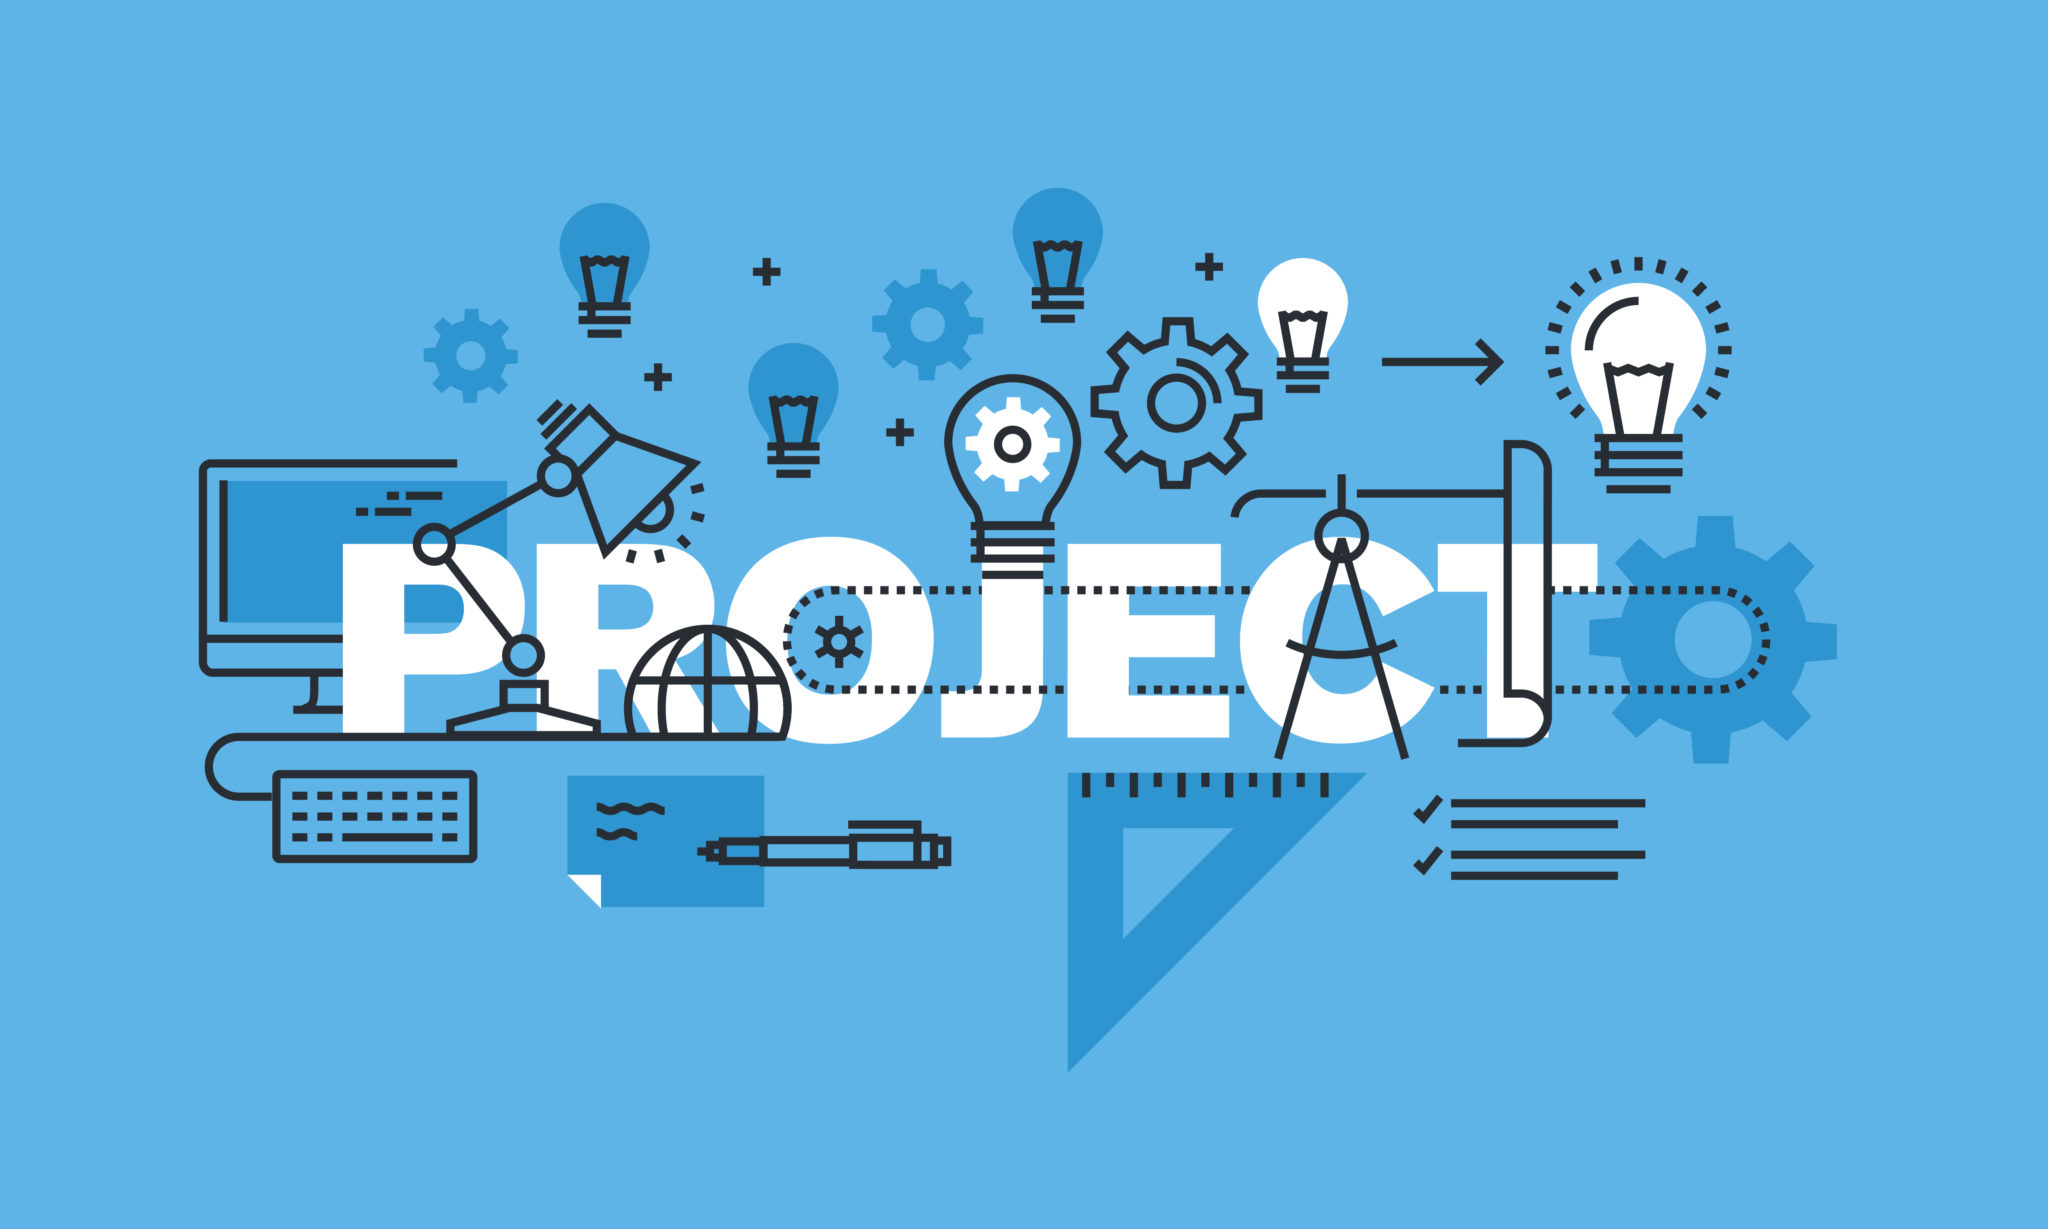 De ce este recomandat să urmezi un curs de project management?